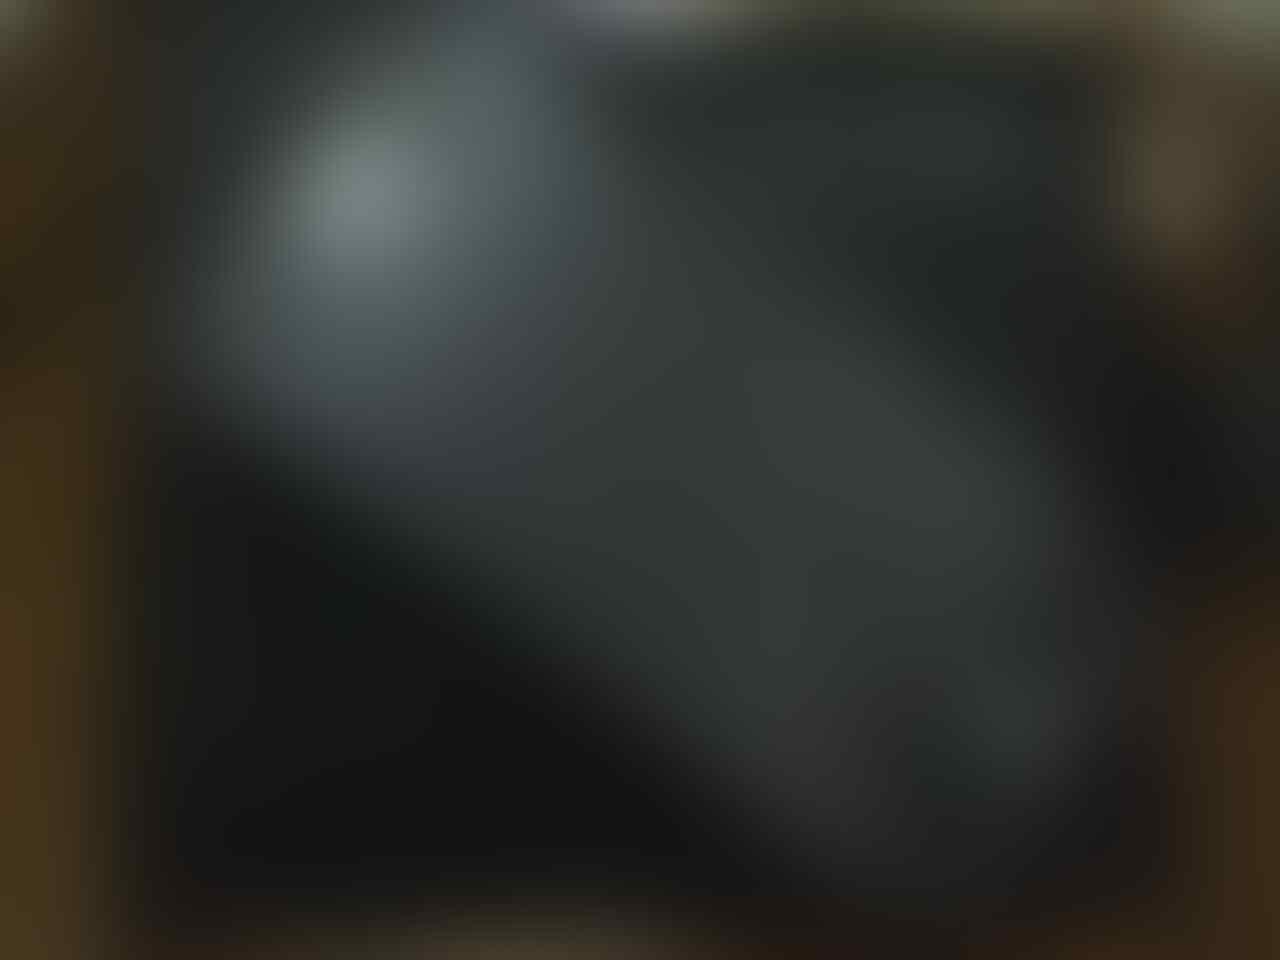 JUAL SAMSUNG GALAXY MEGA 5.8 BLACK